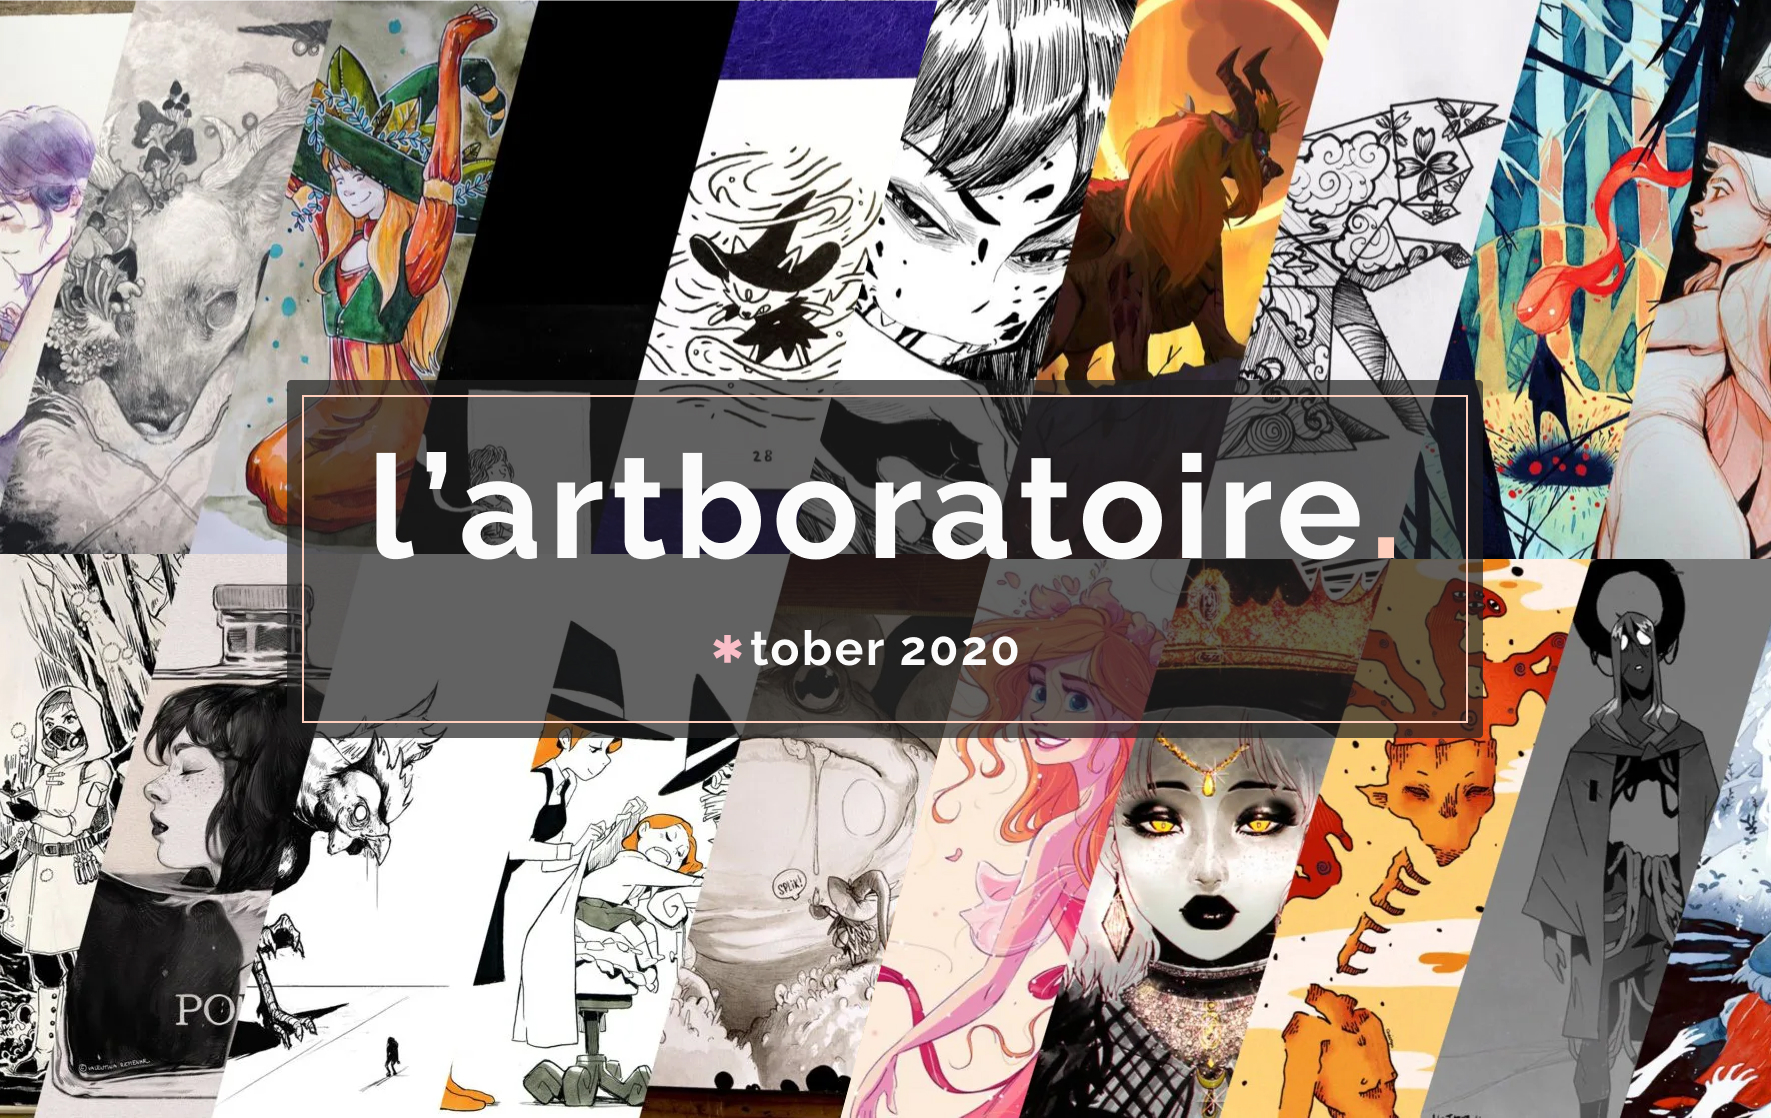 inktober_2020_lartboratoire